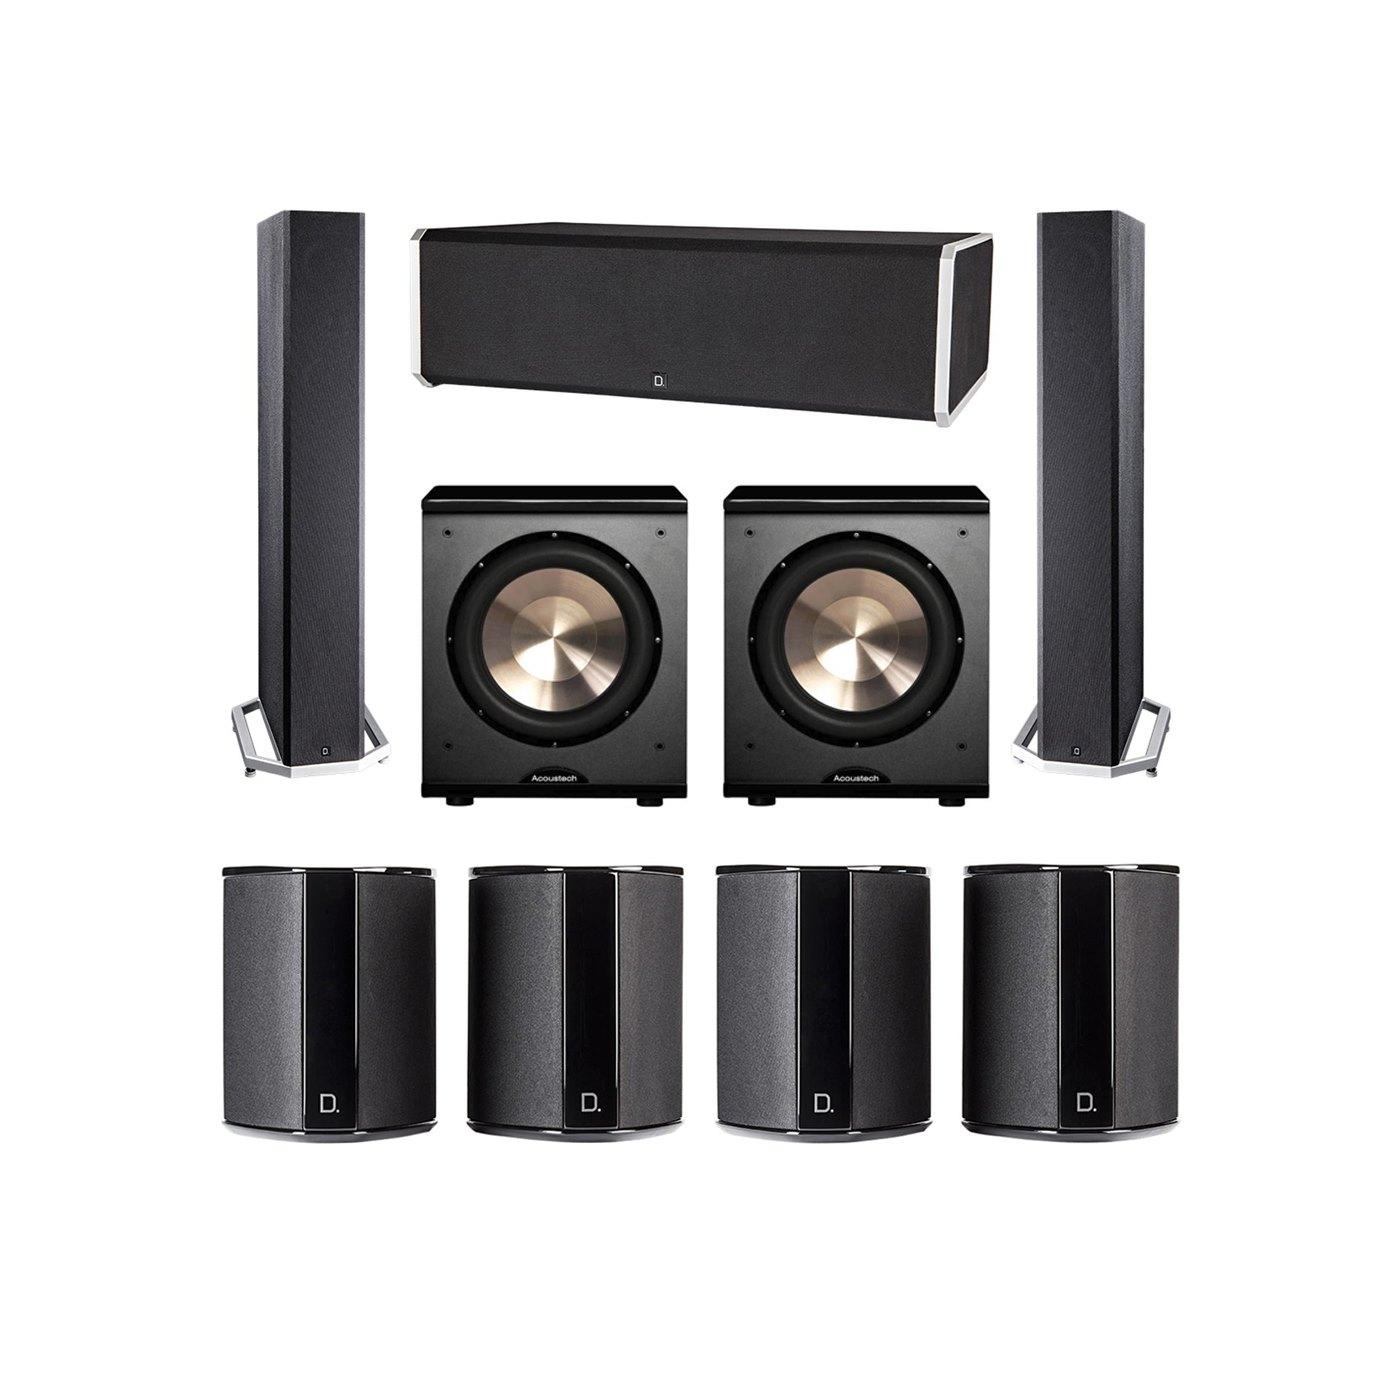 Definitive Technology 7.2 System with 2 BP9040 Tower Speakers, 1 CS9080 Center Channel Speaker, 4 SR9040 Surround Speaker, 2 BIC PL-200 Subwoofer